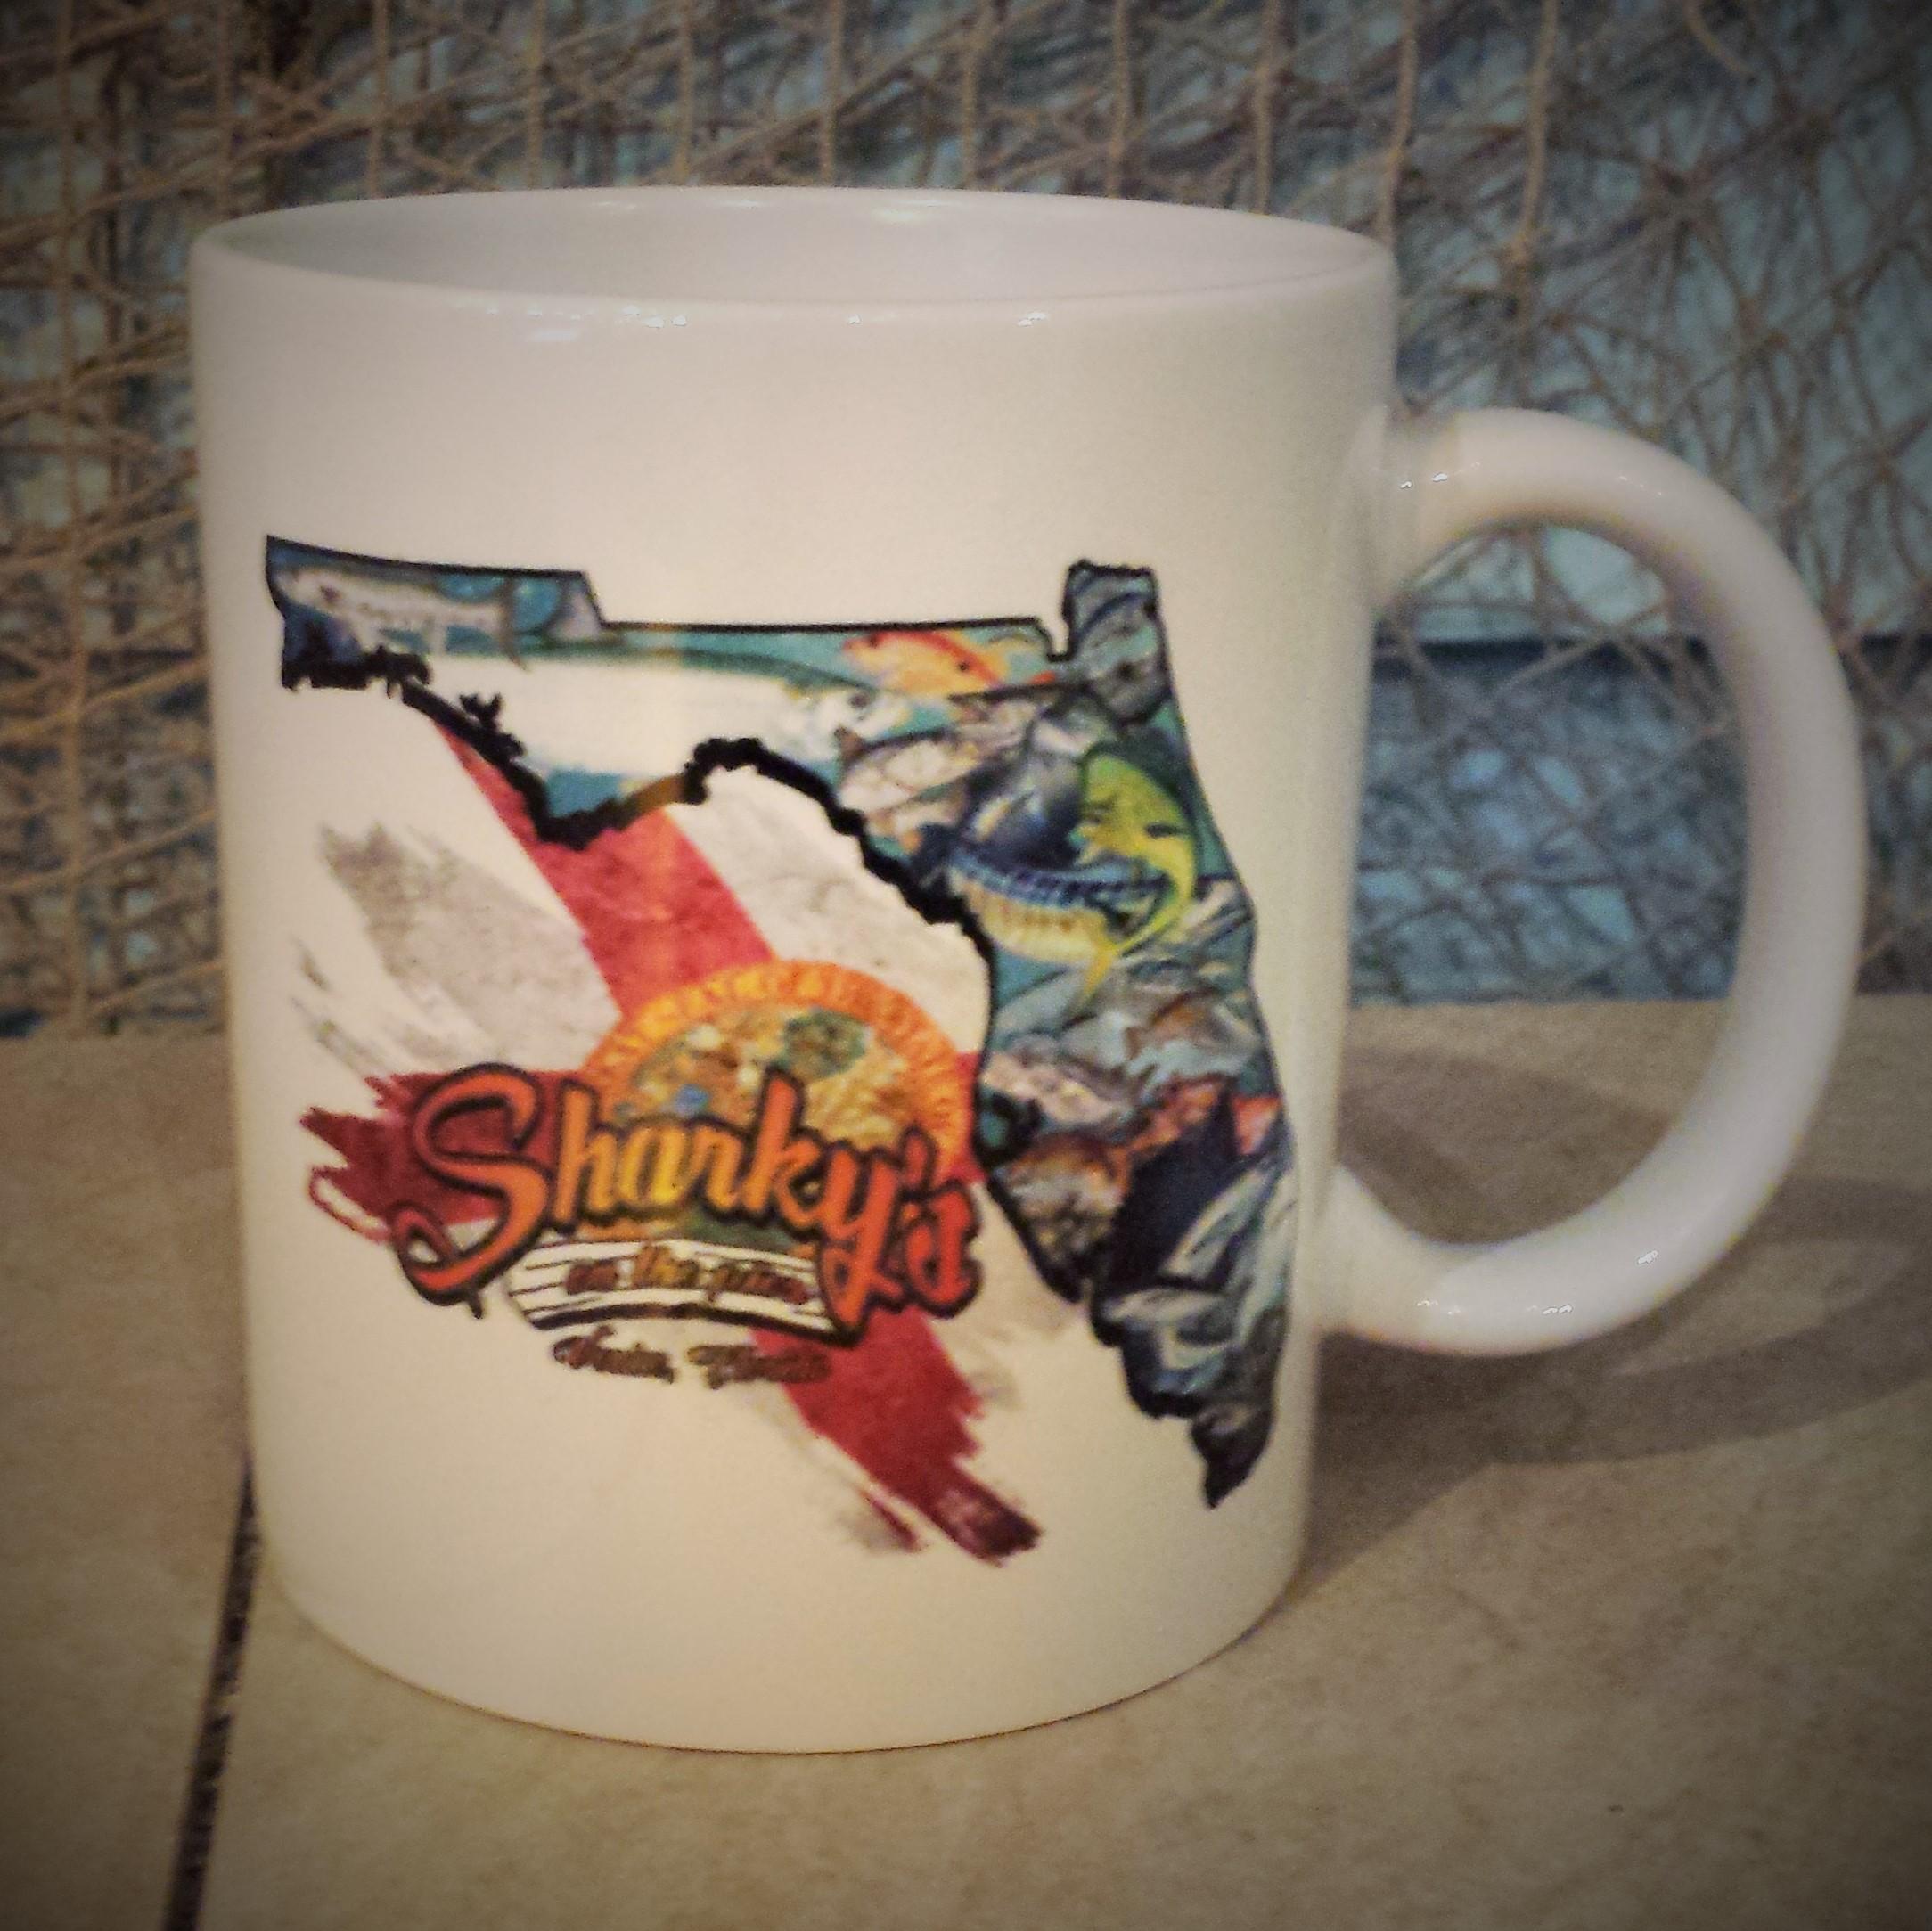 Sharky's Coffee mug